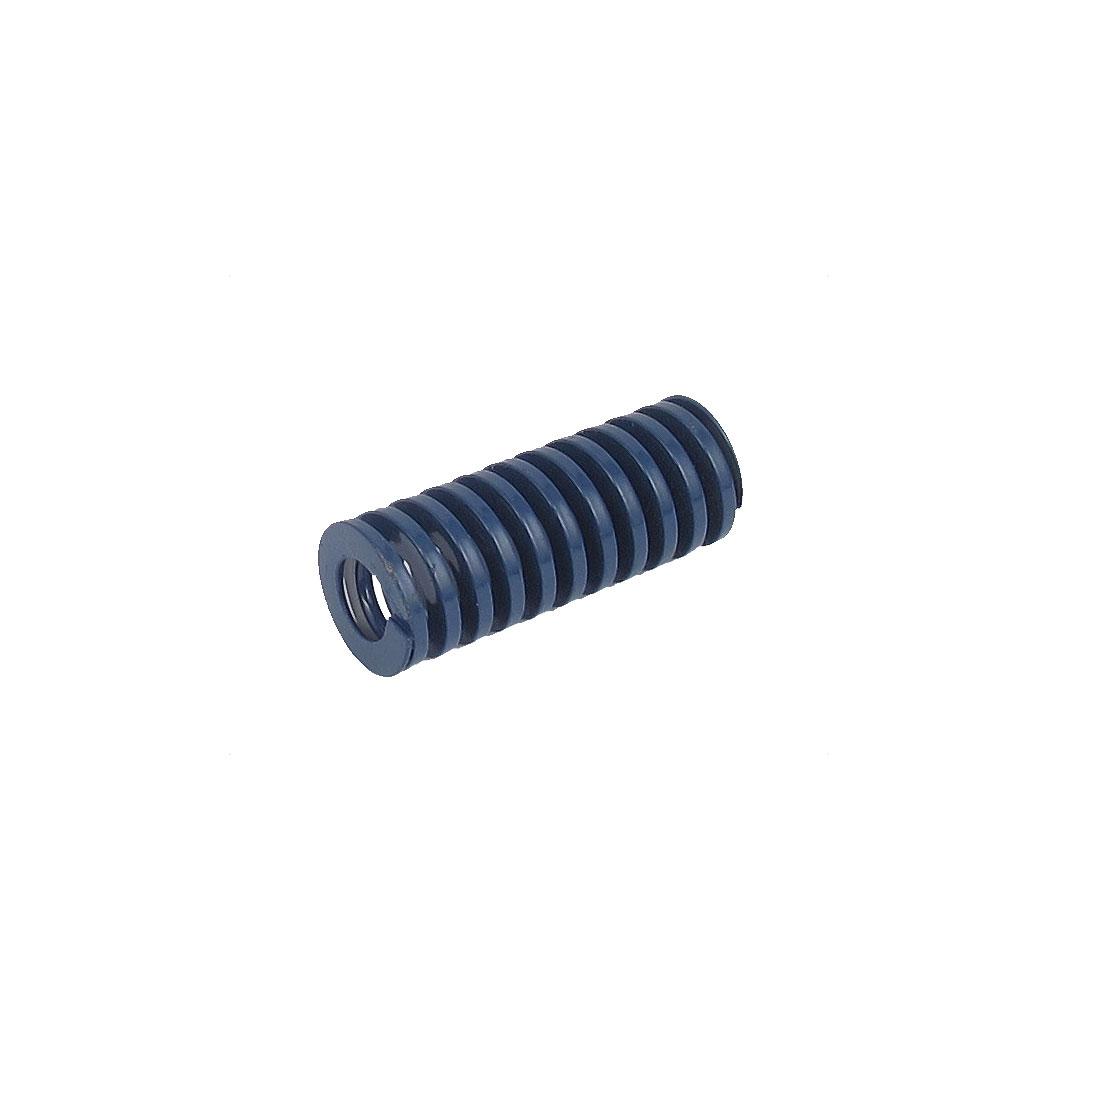 14mmx35mm Chromium Alloy Steel Light Load Die Spring Blue